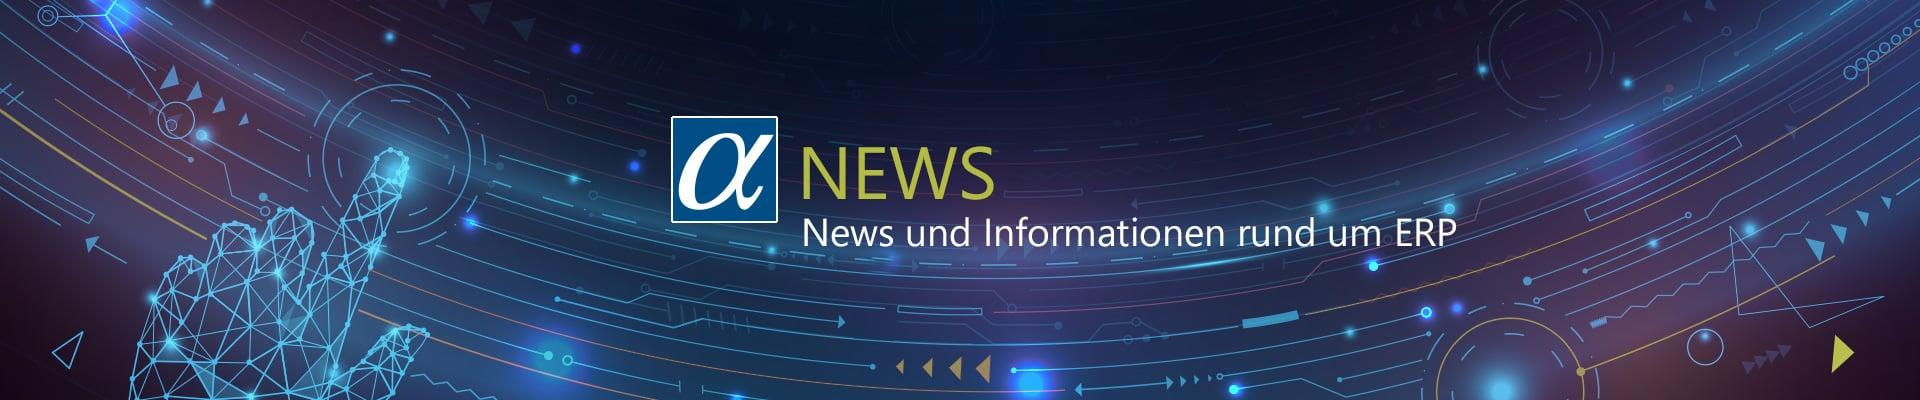 news-neu